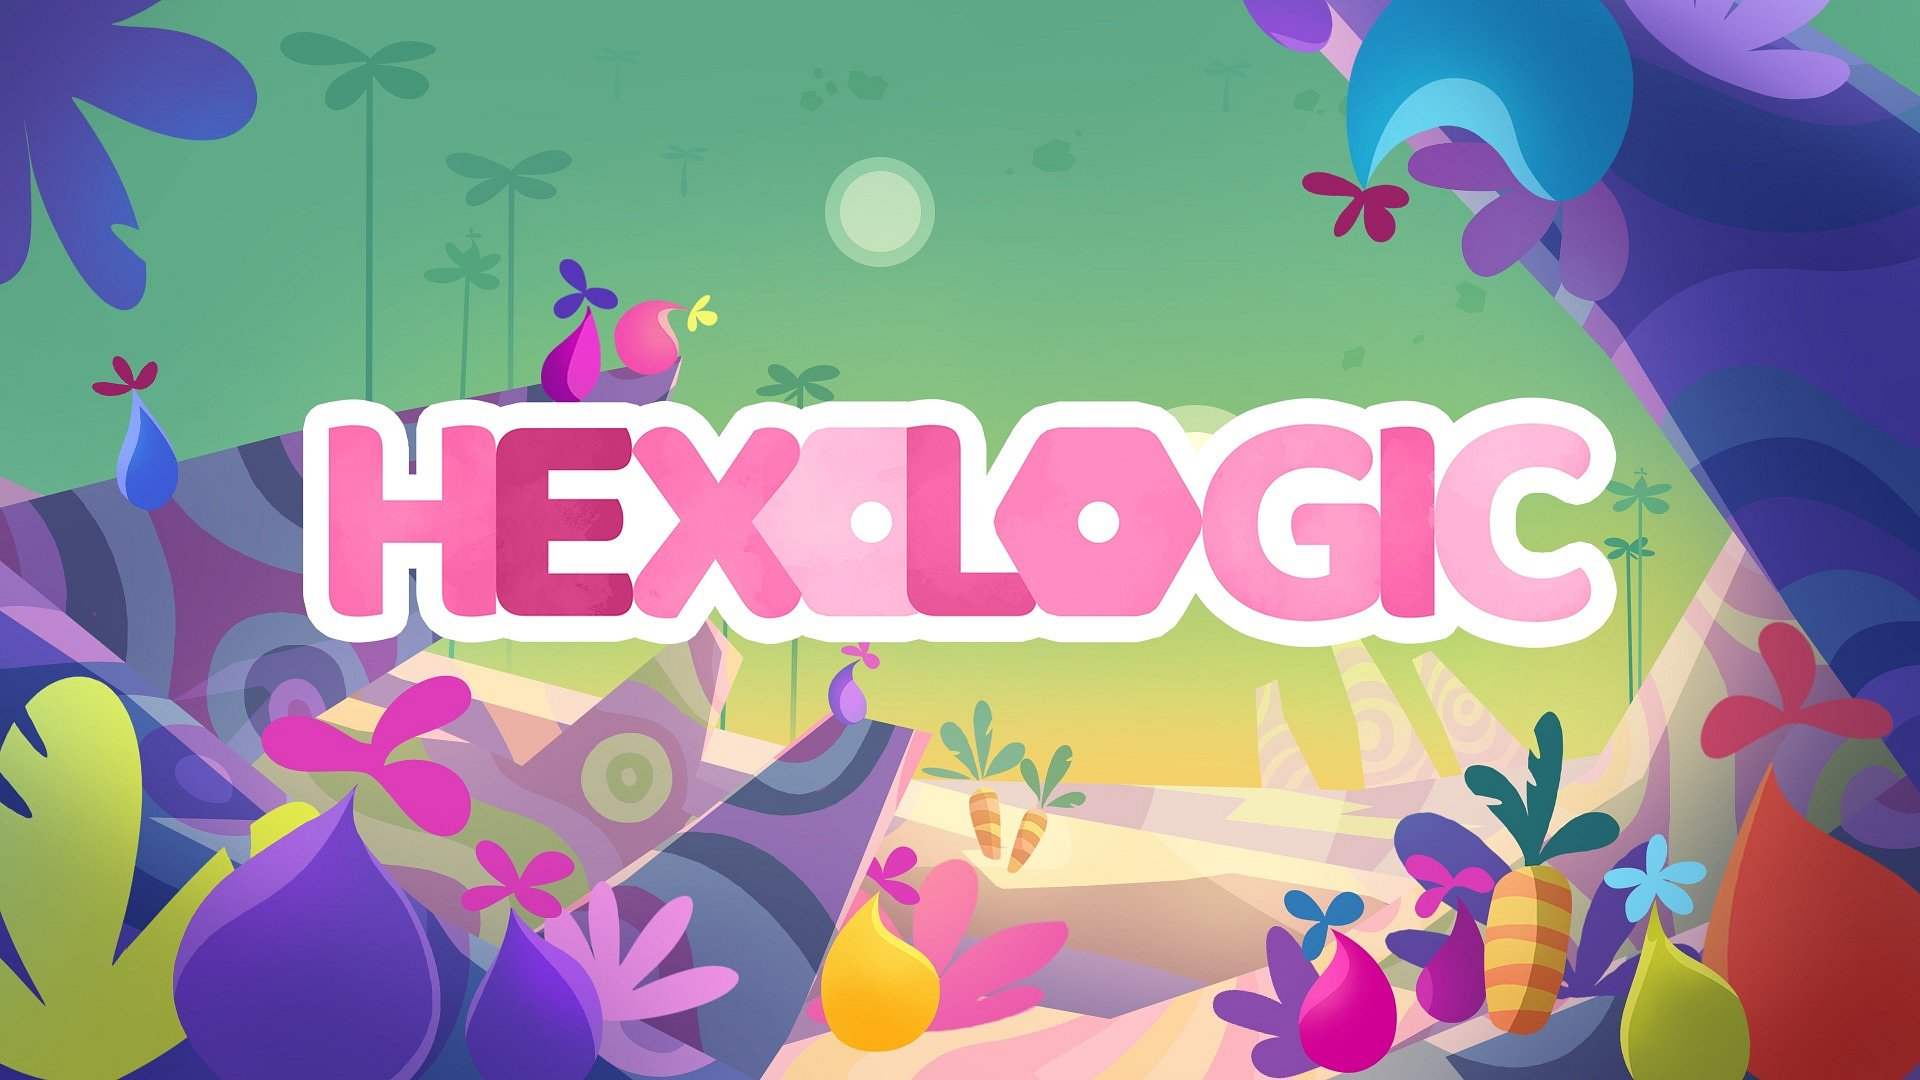 Hexologic, an award-winning iOS puzzler, arrives on Apple TV!